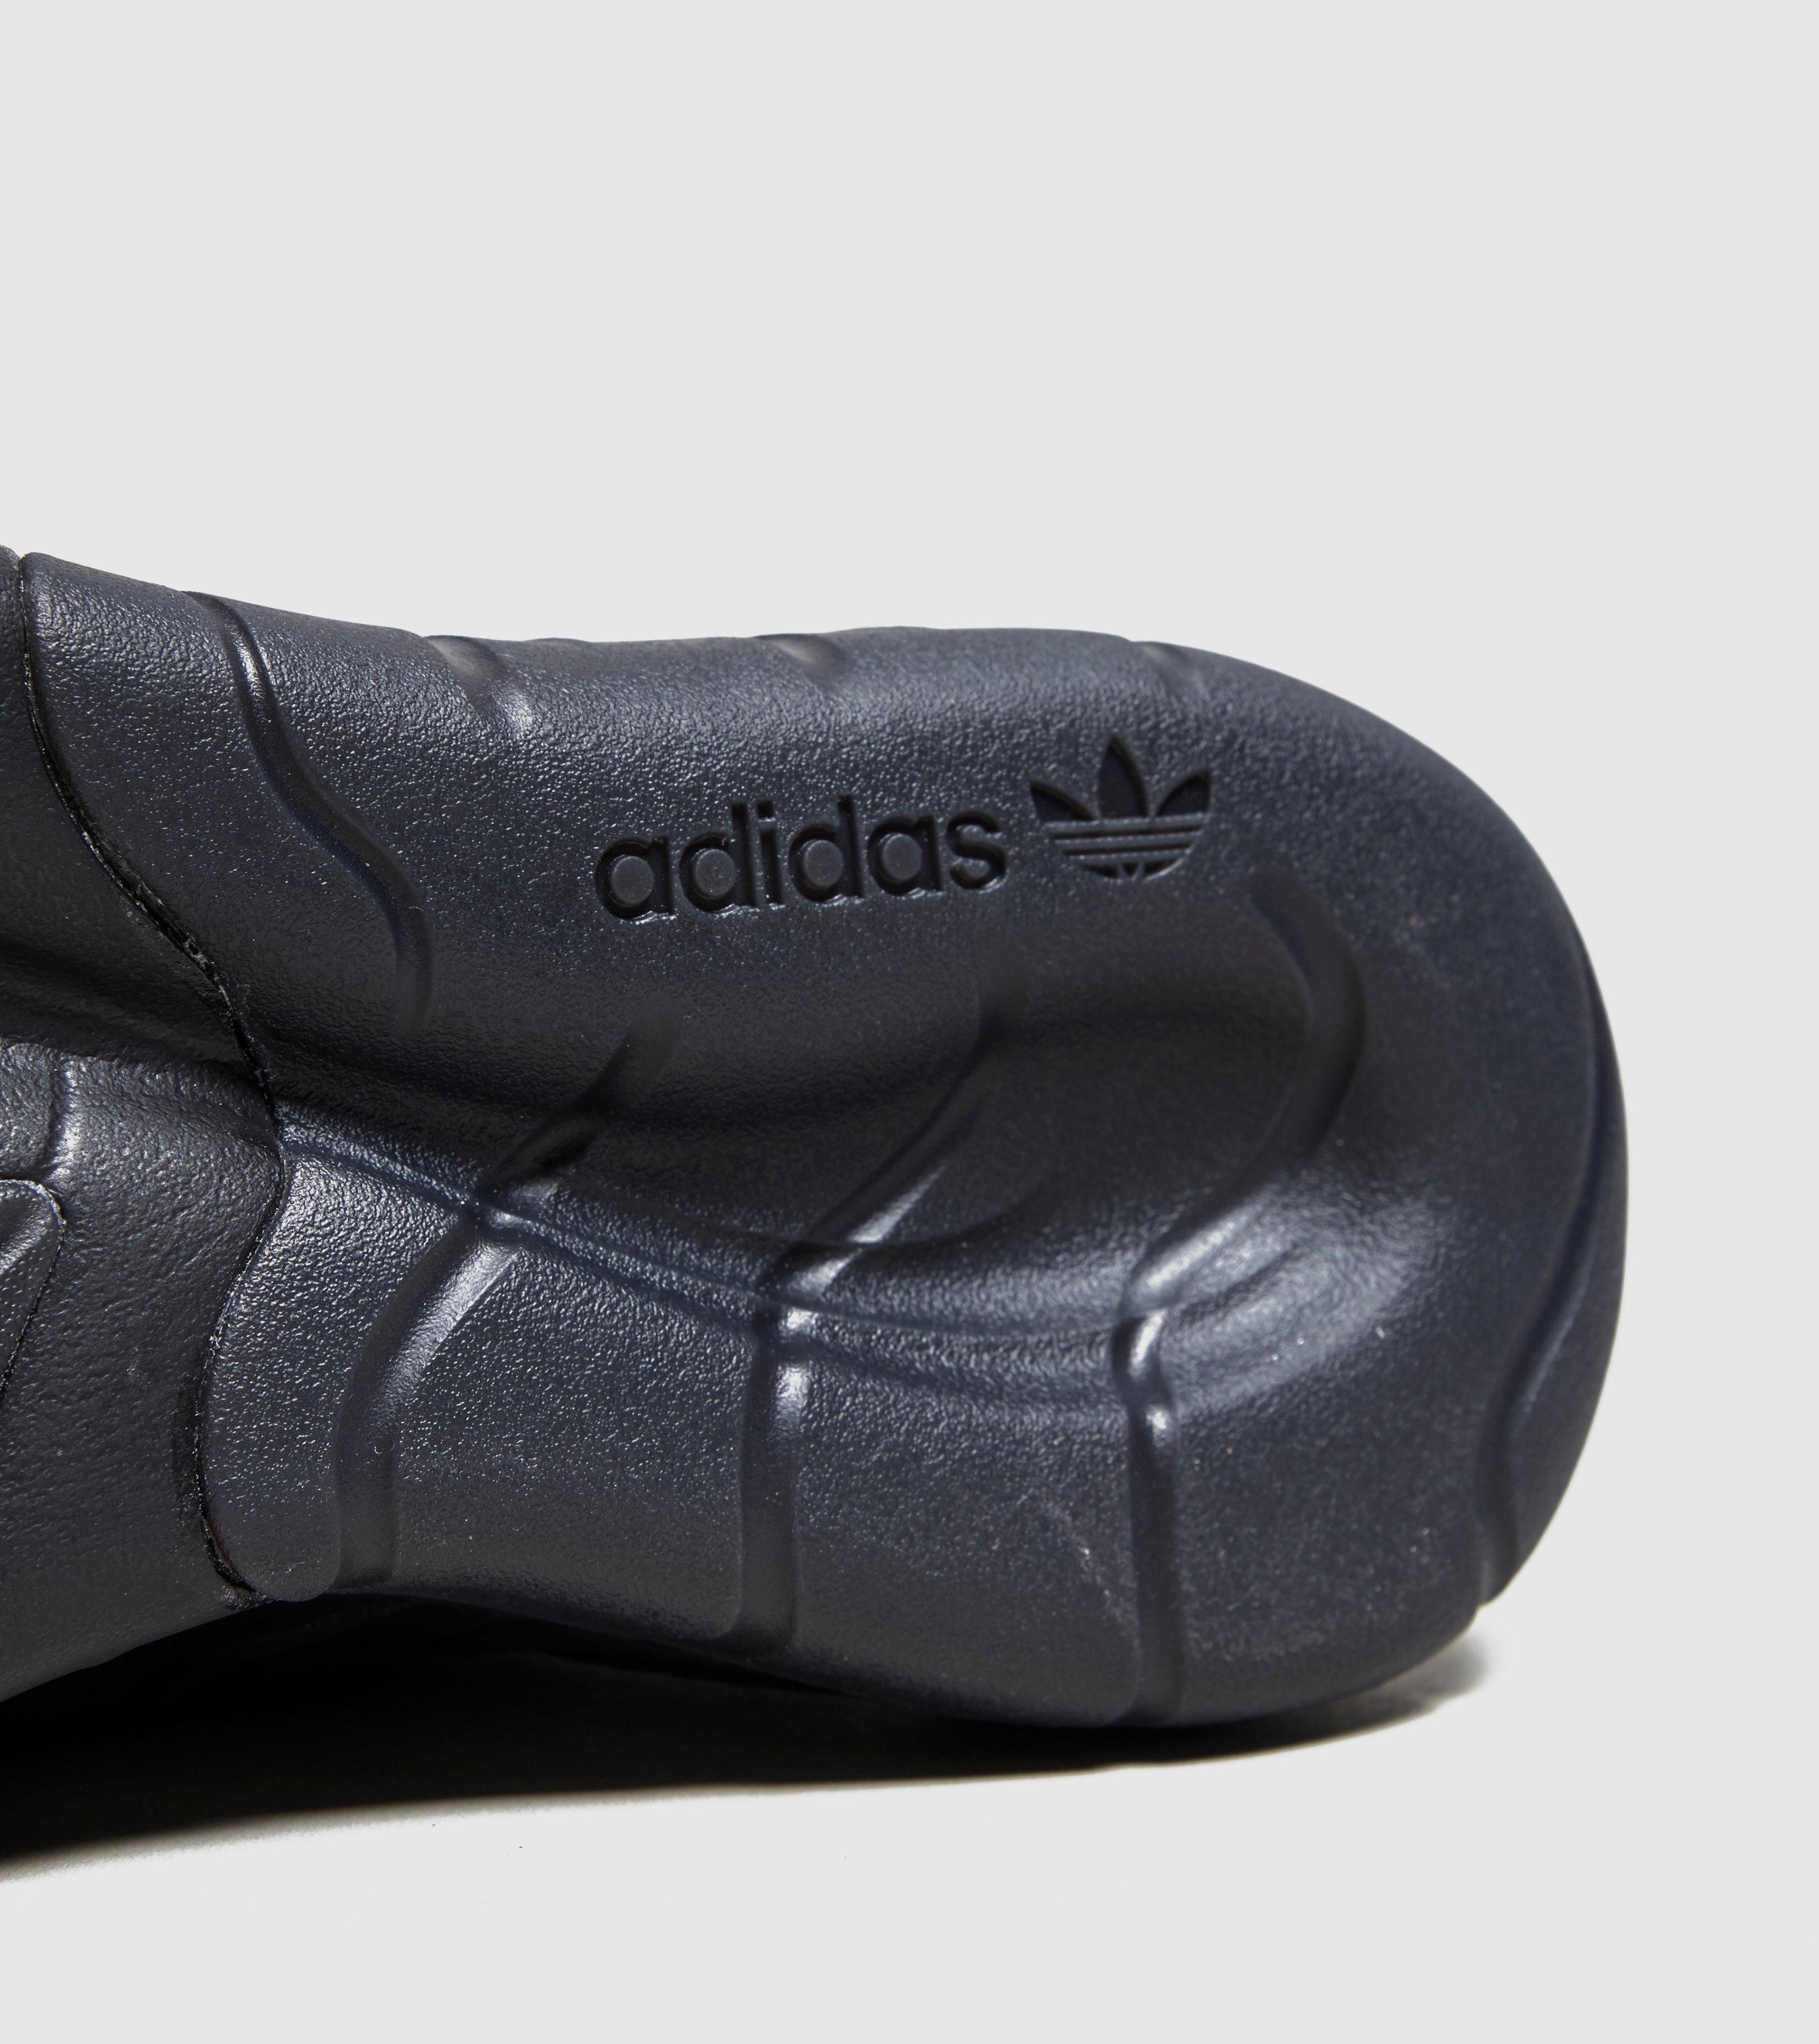 2016 Cheap Adidas Original Tubular Radial Shoes Fleece Solid Grey